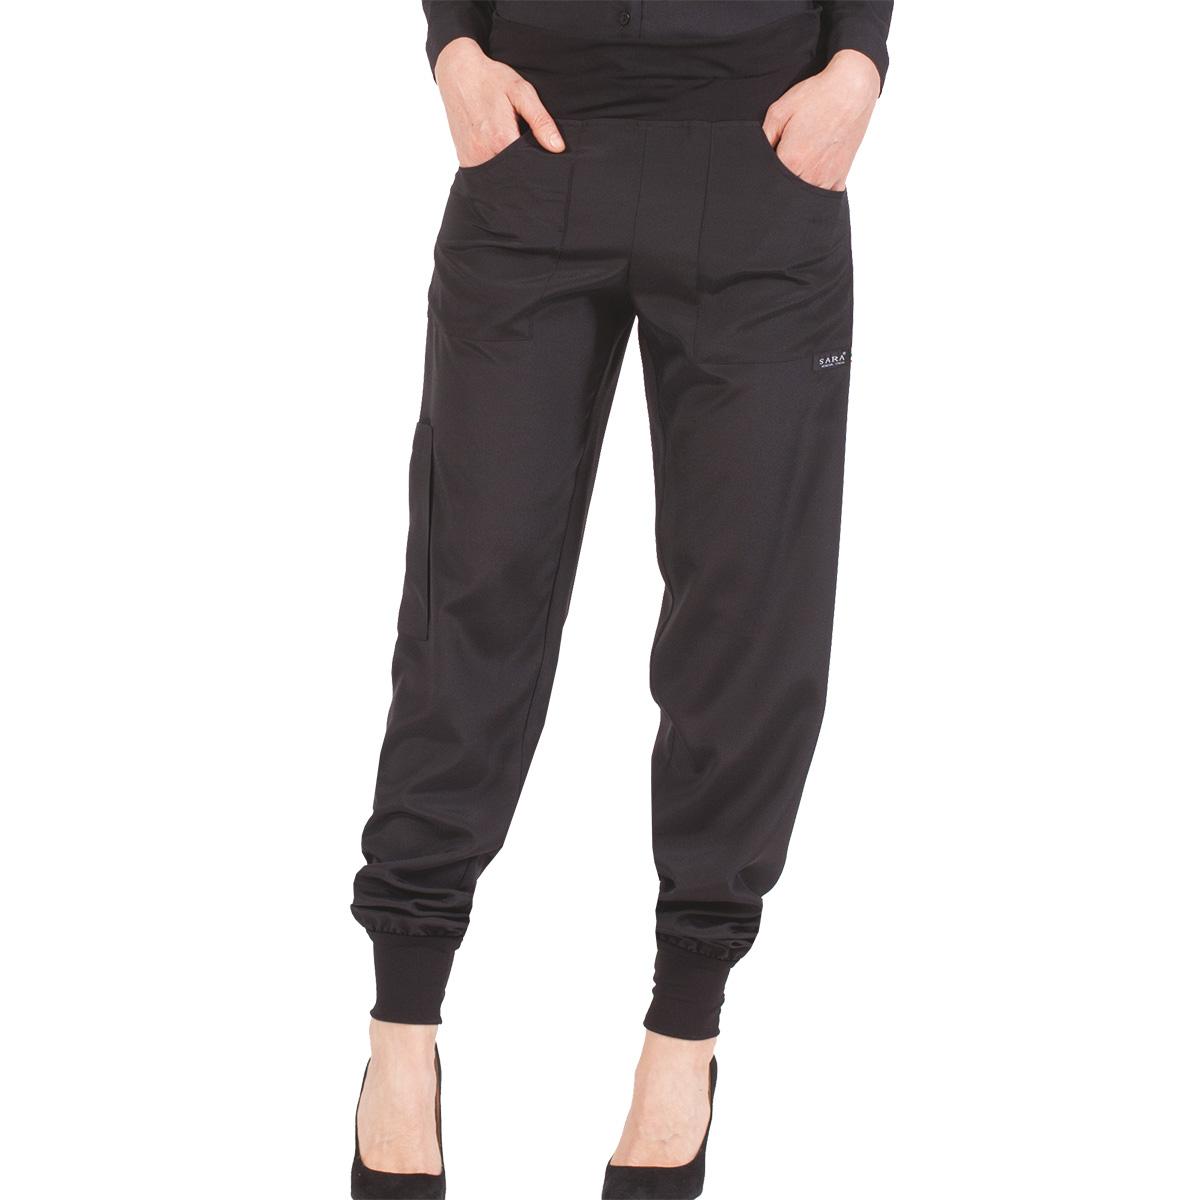 pantalone-polsini